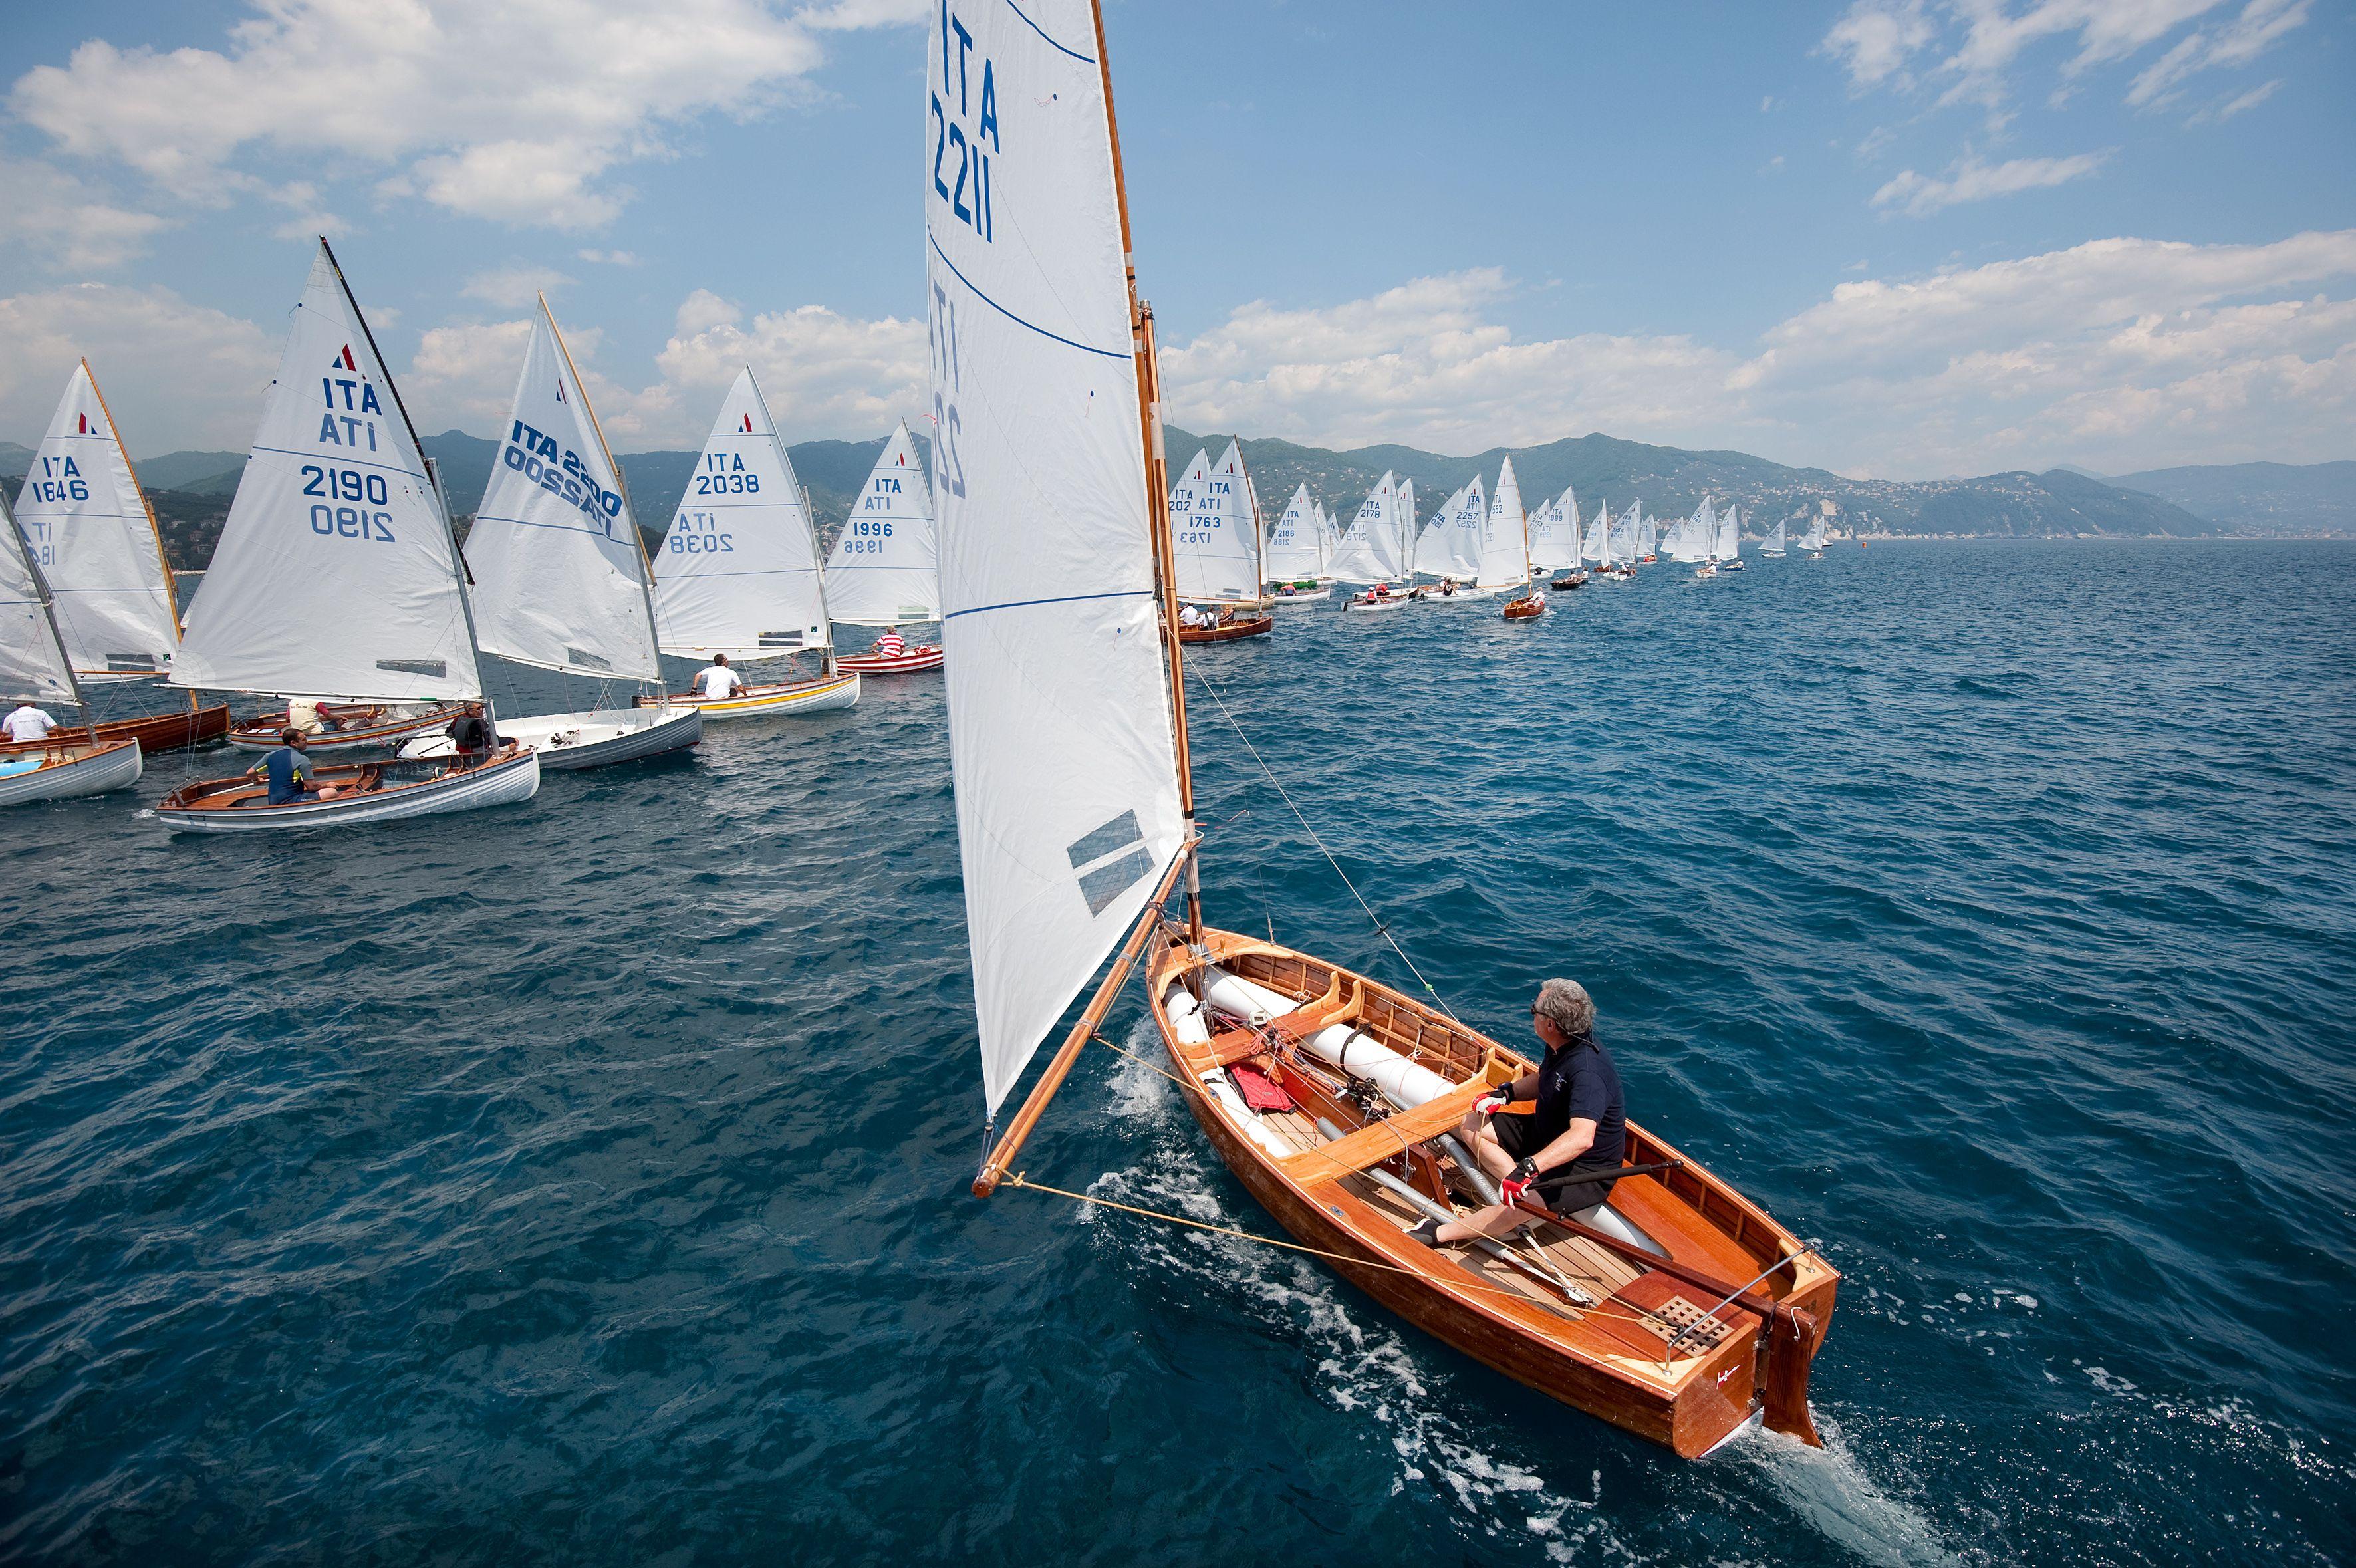 Trofeo_siad_portofino_dinghy